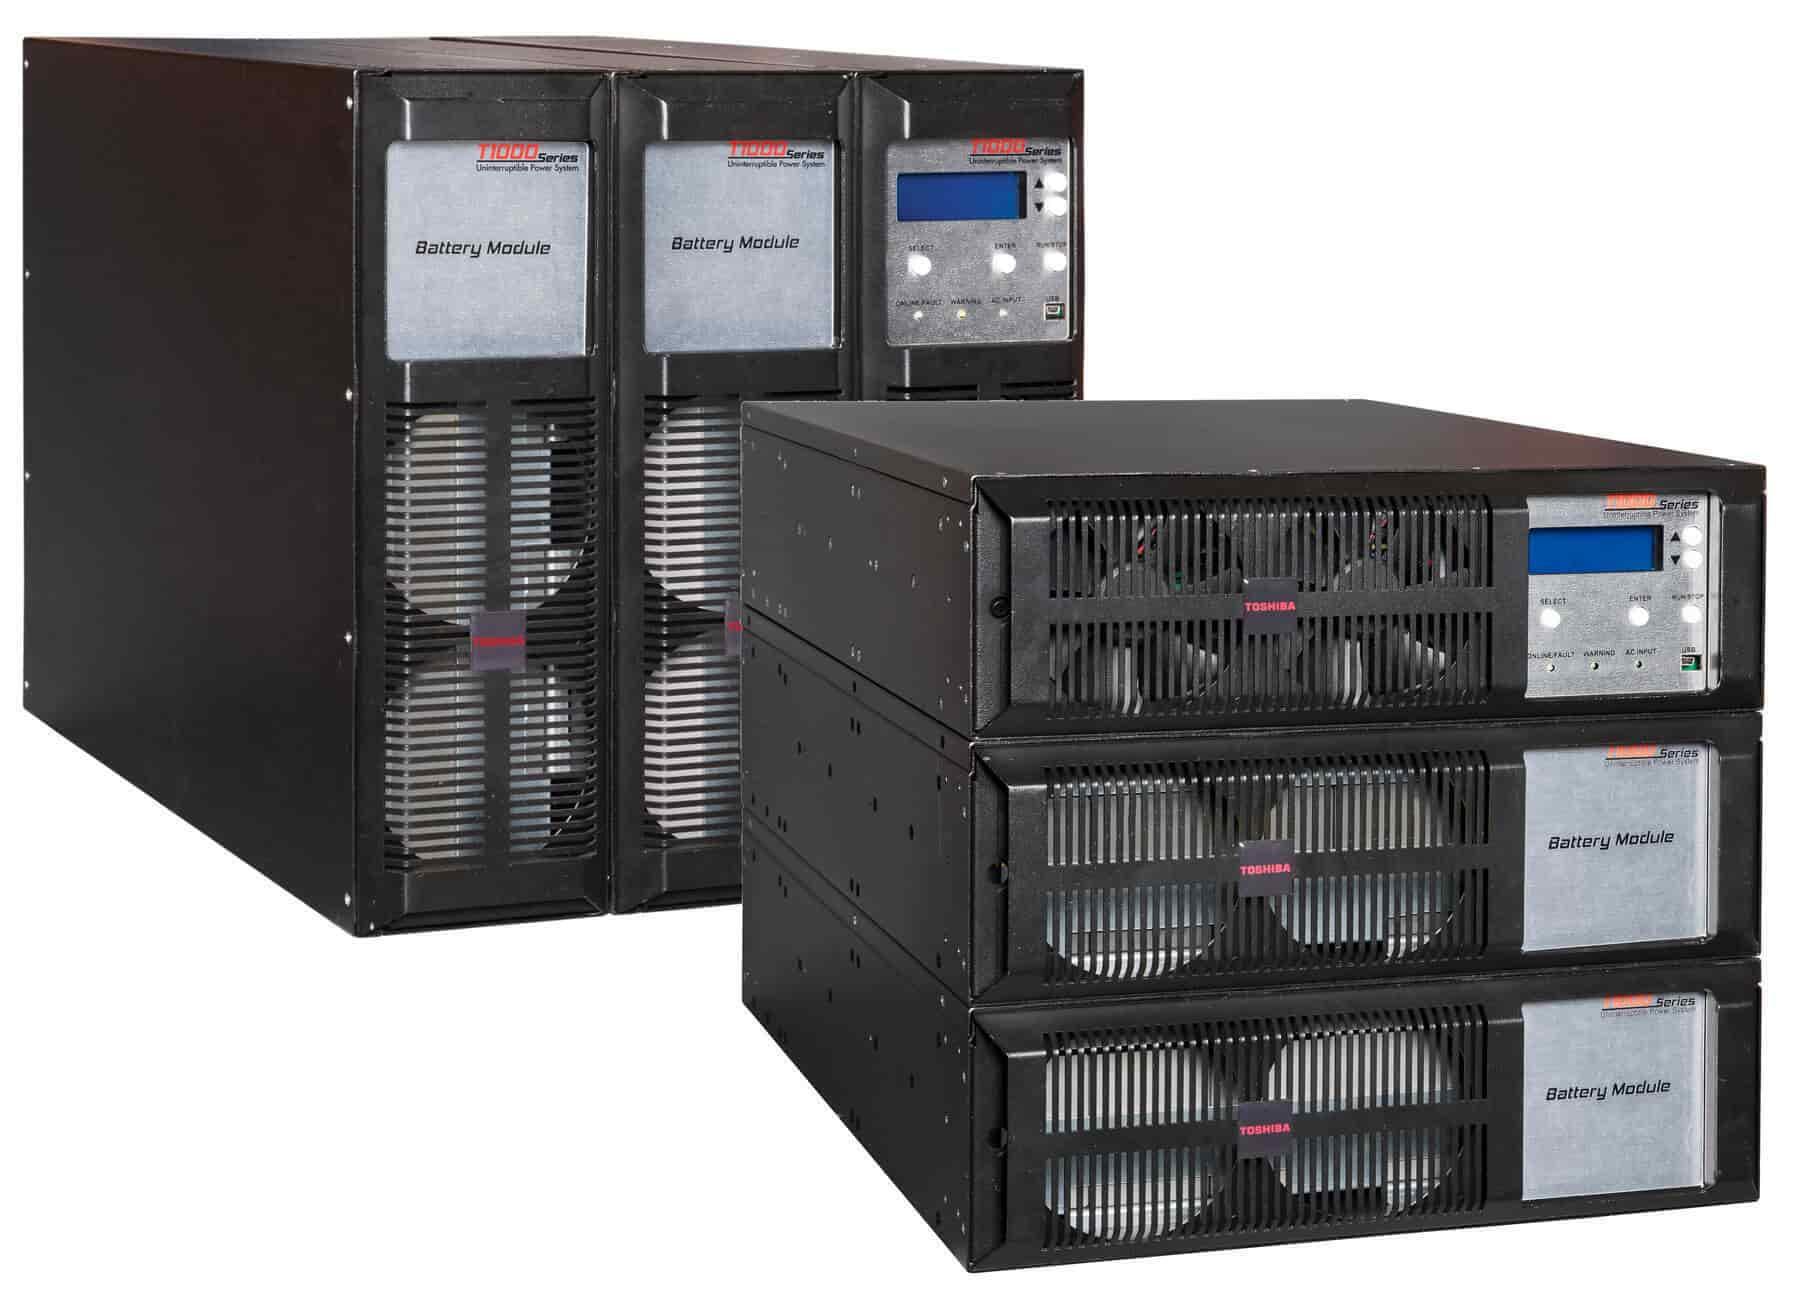 t1000 series ups 16kva power electronics toshiba international rh toshiba com Staples UPS Power Supply UPS System